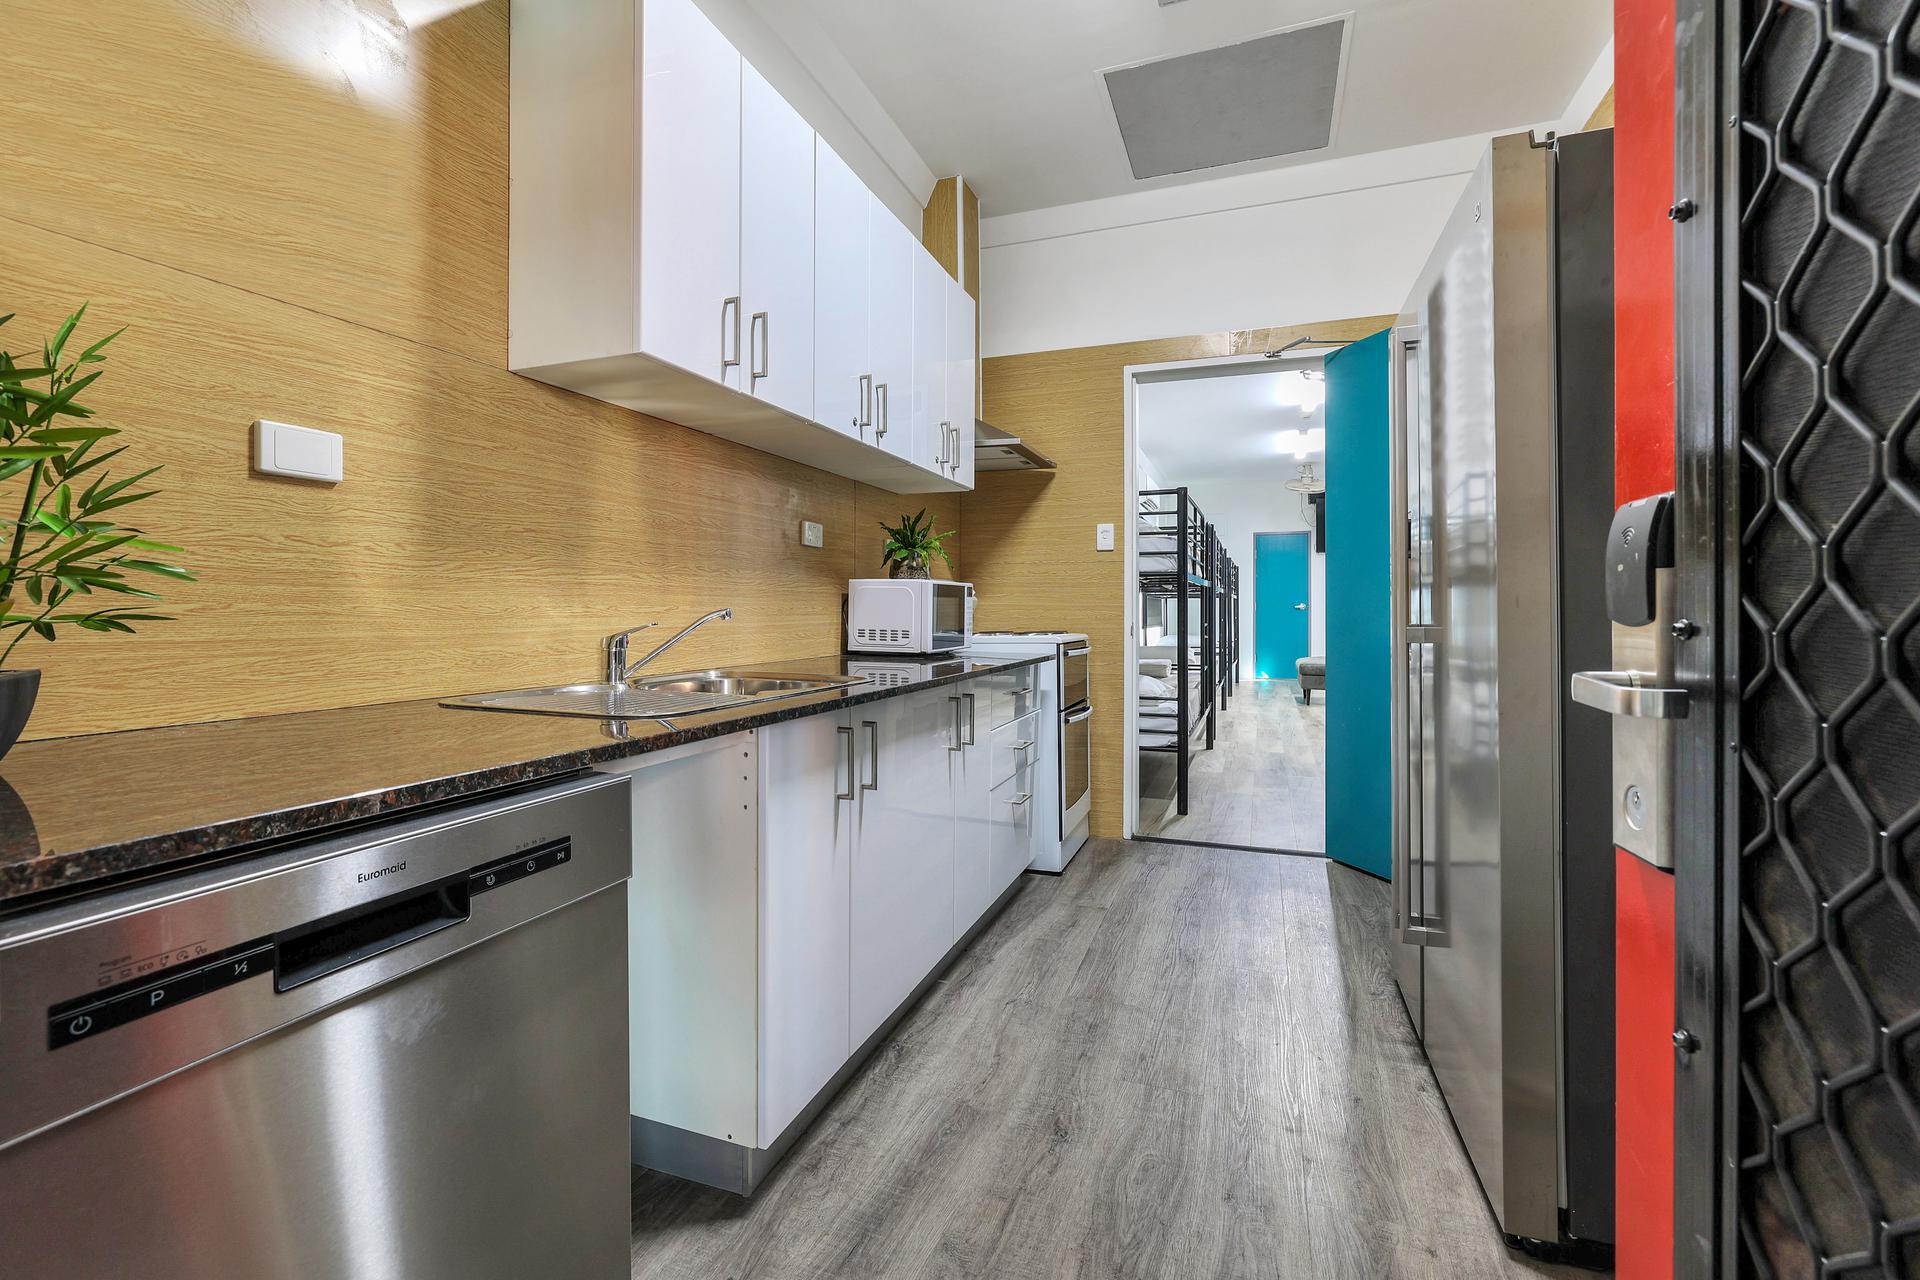 Darwin hotel room kitchen